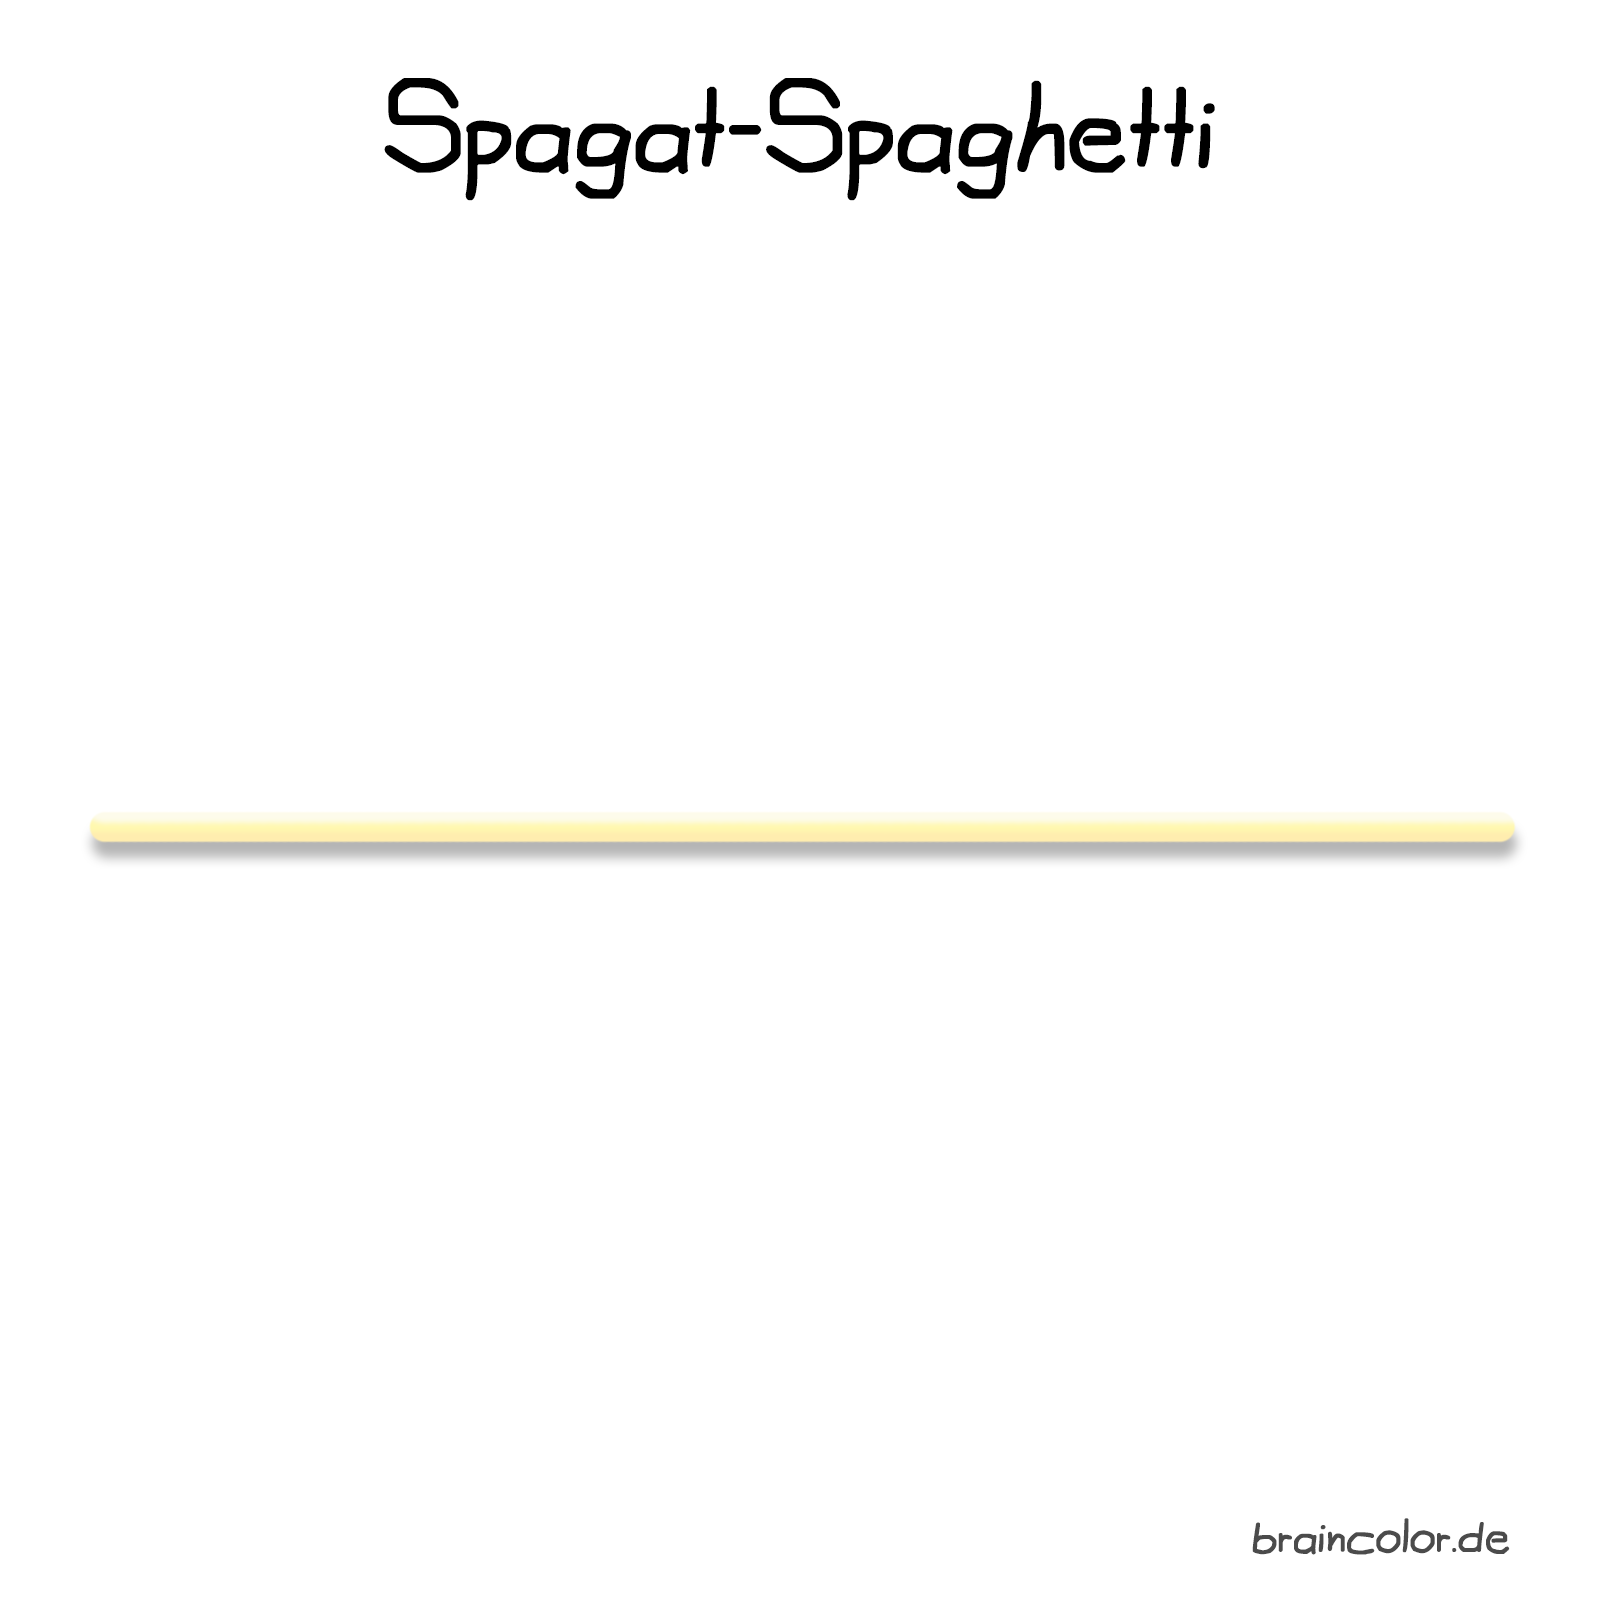 Spagat-Spaghetti